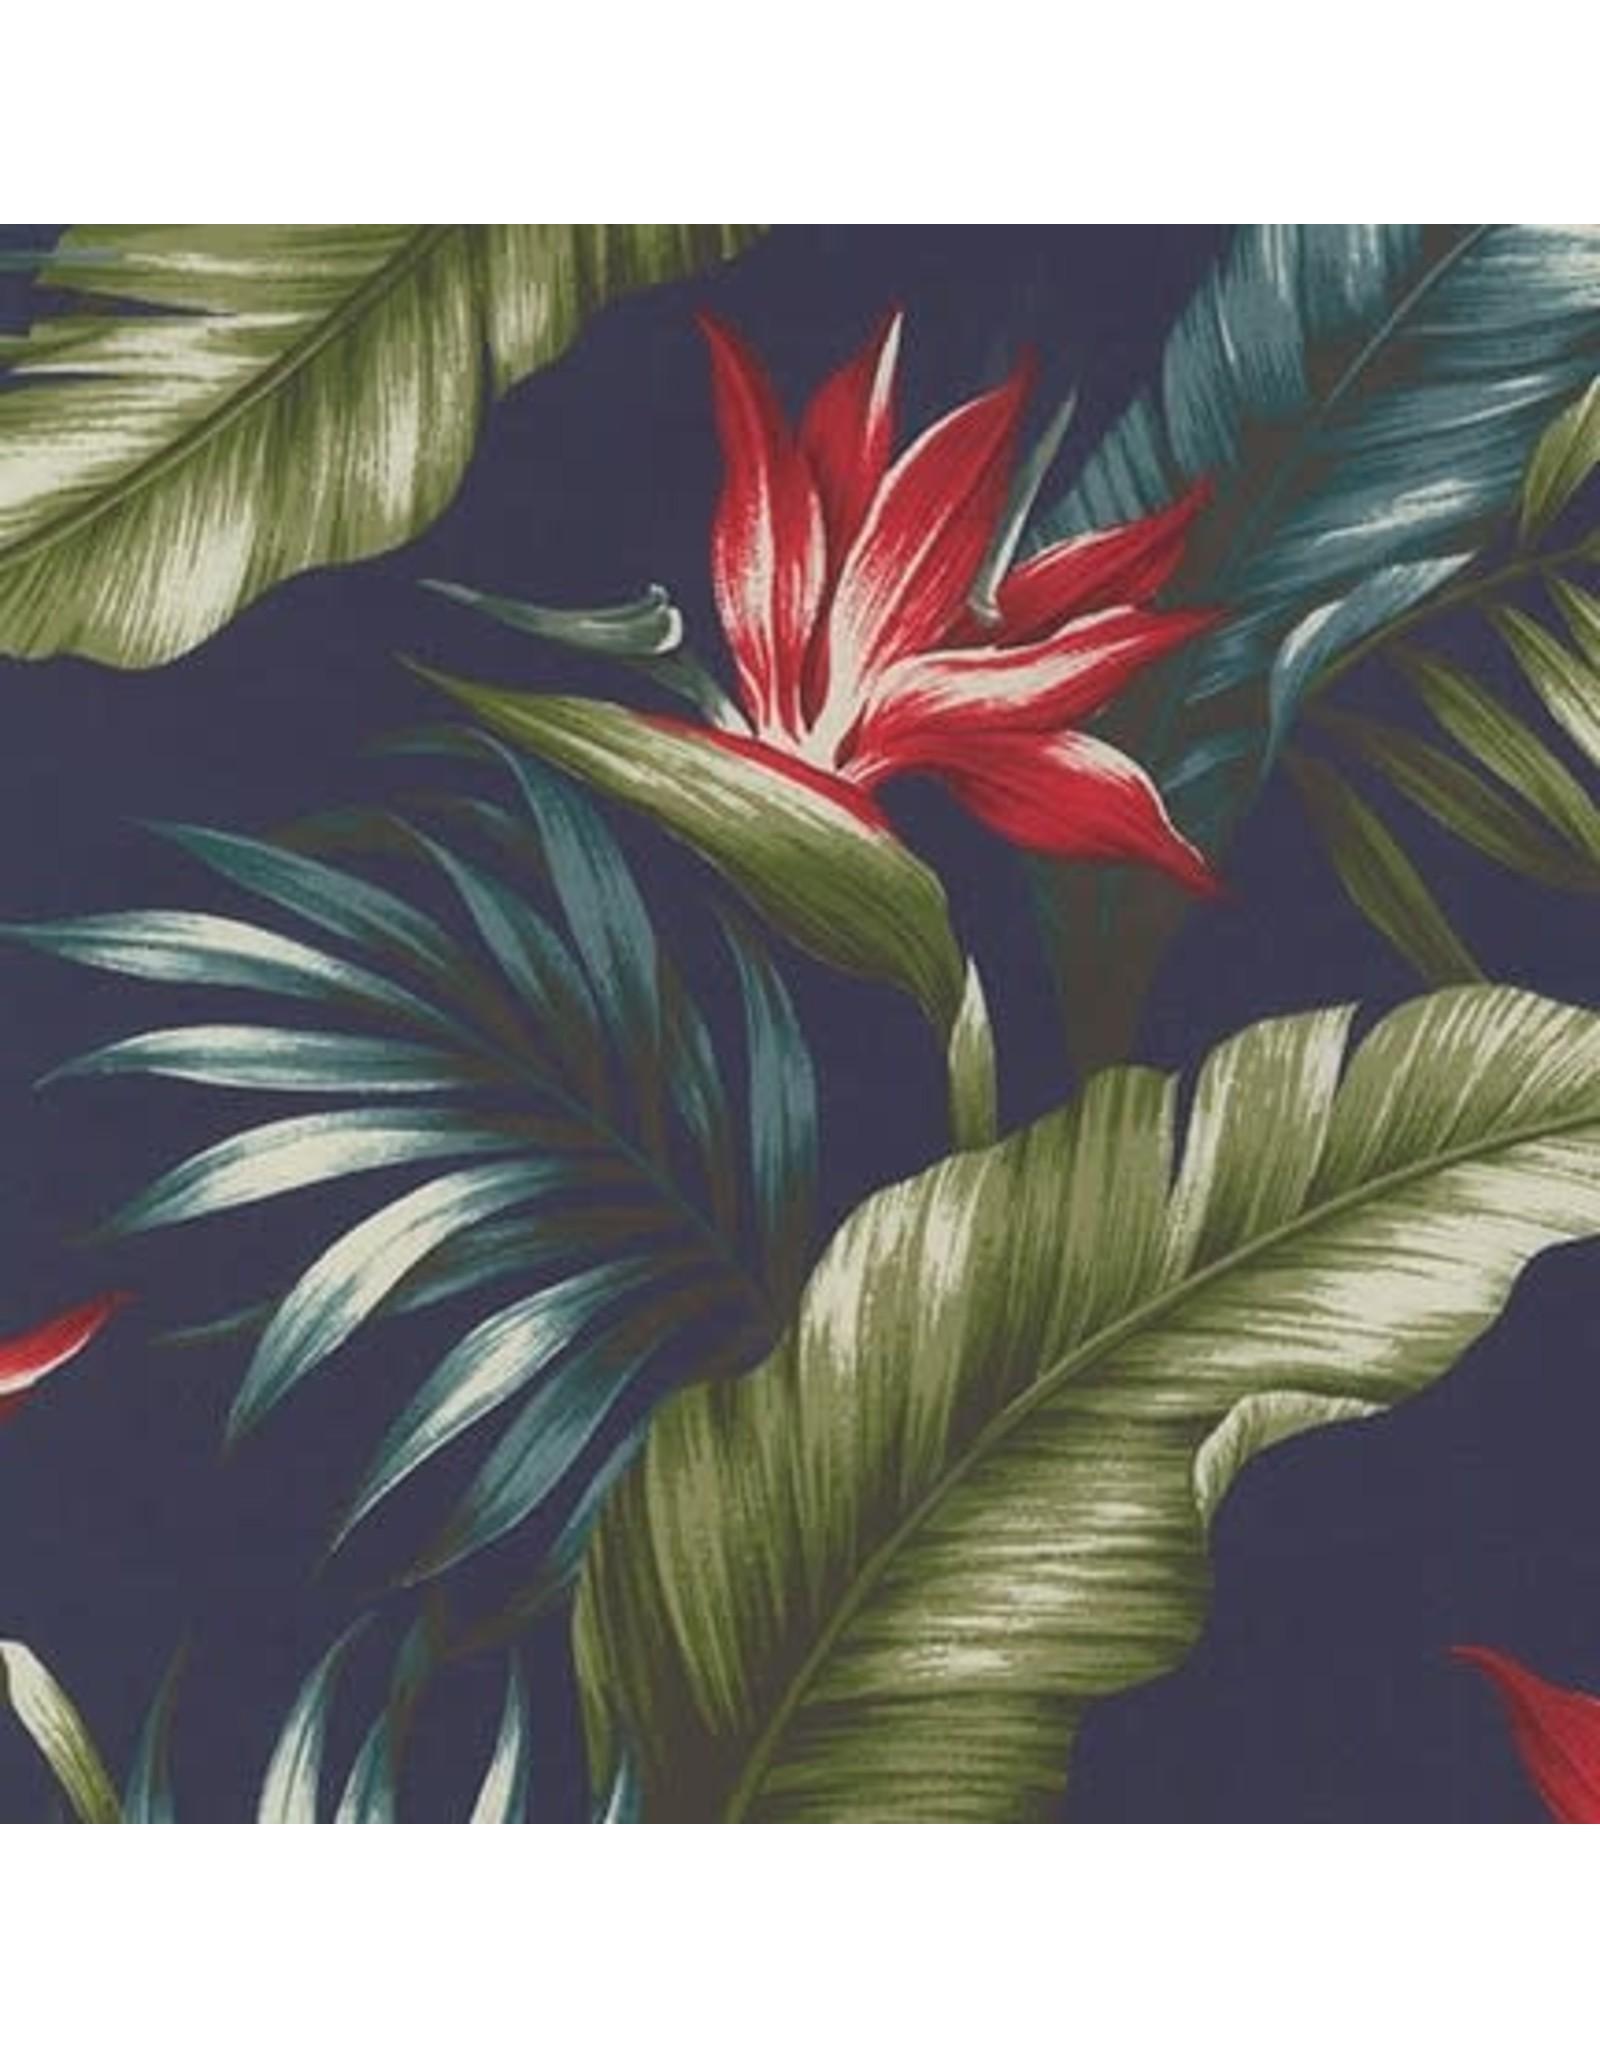 Sevenberry Rayon Lawn, Ecovero Aloha Prints, Bird of Paradise in Navy, Fabric Half-Yards